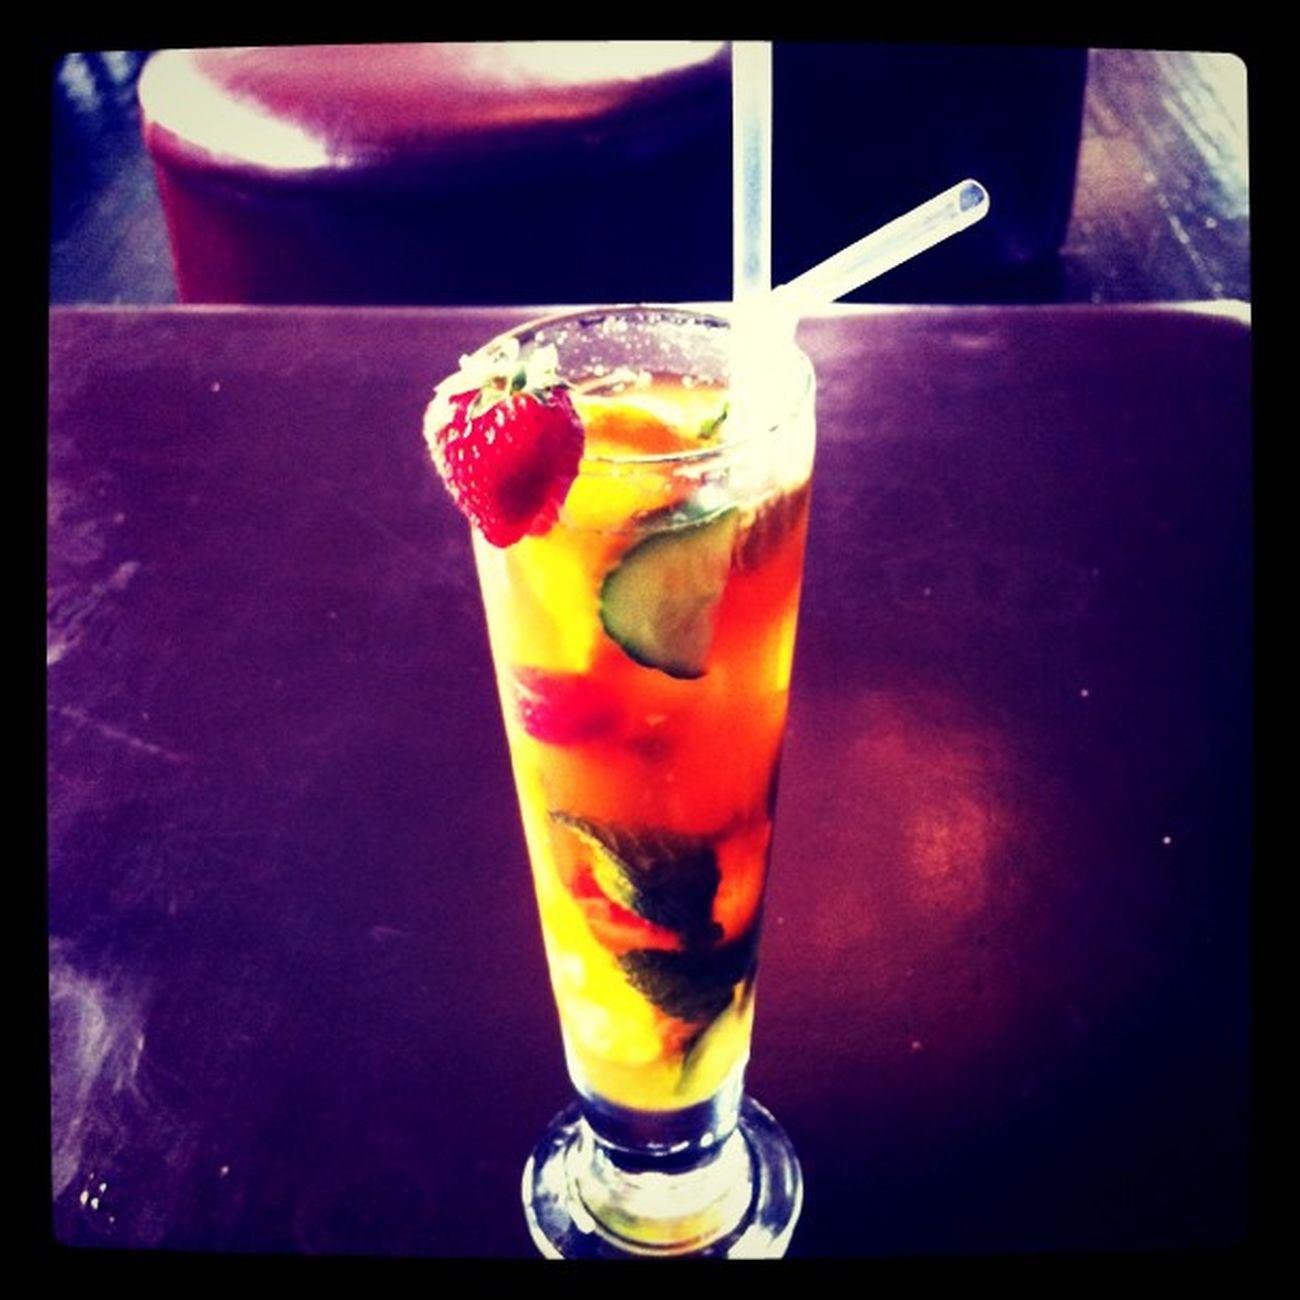 Getting my drink on #pimmsoclock Pimmsoclock